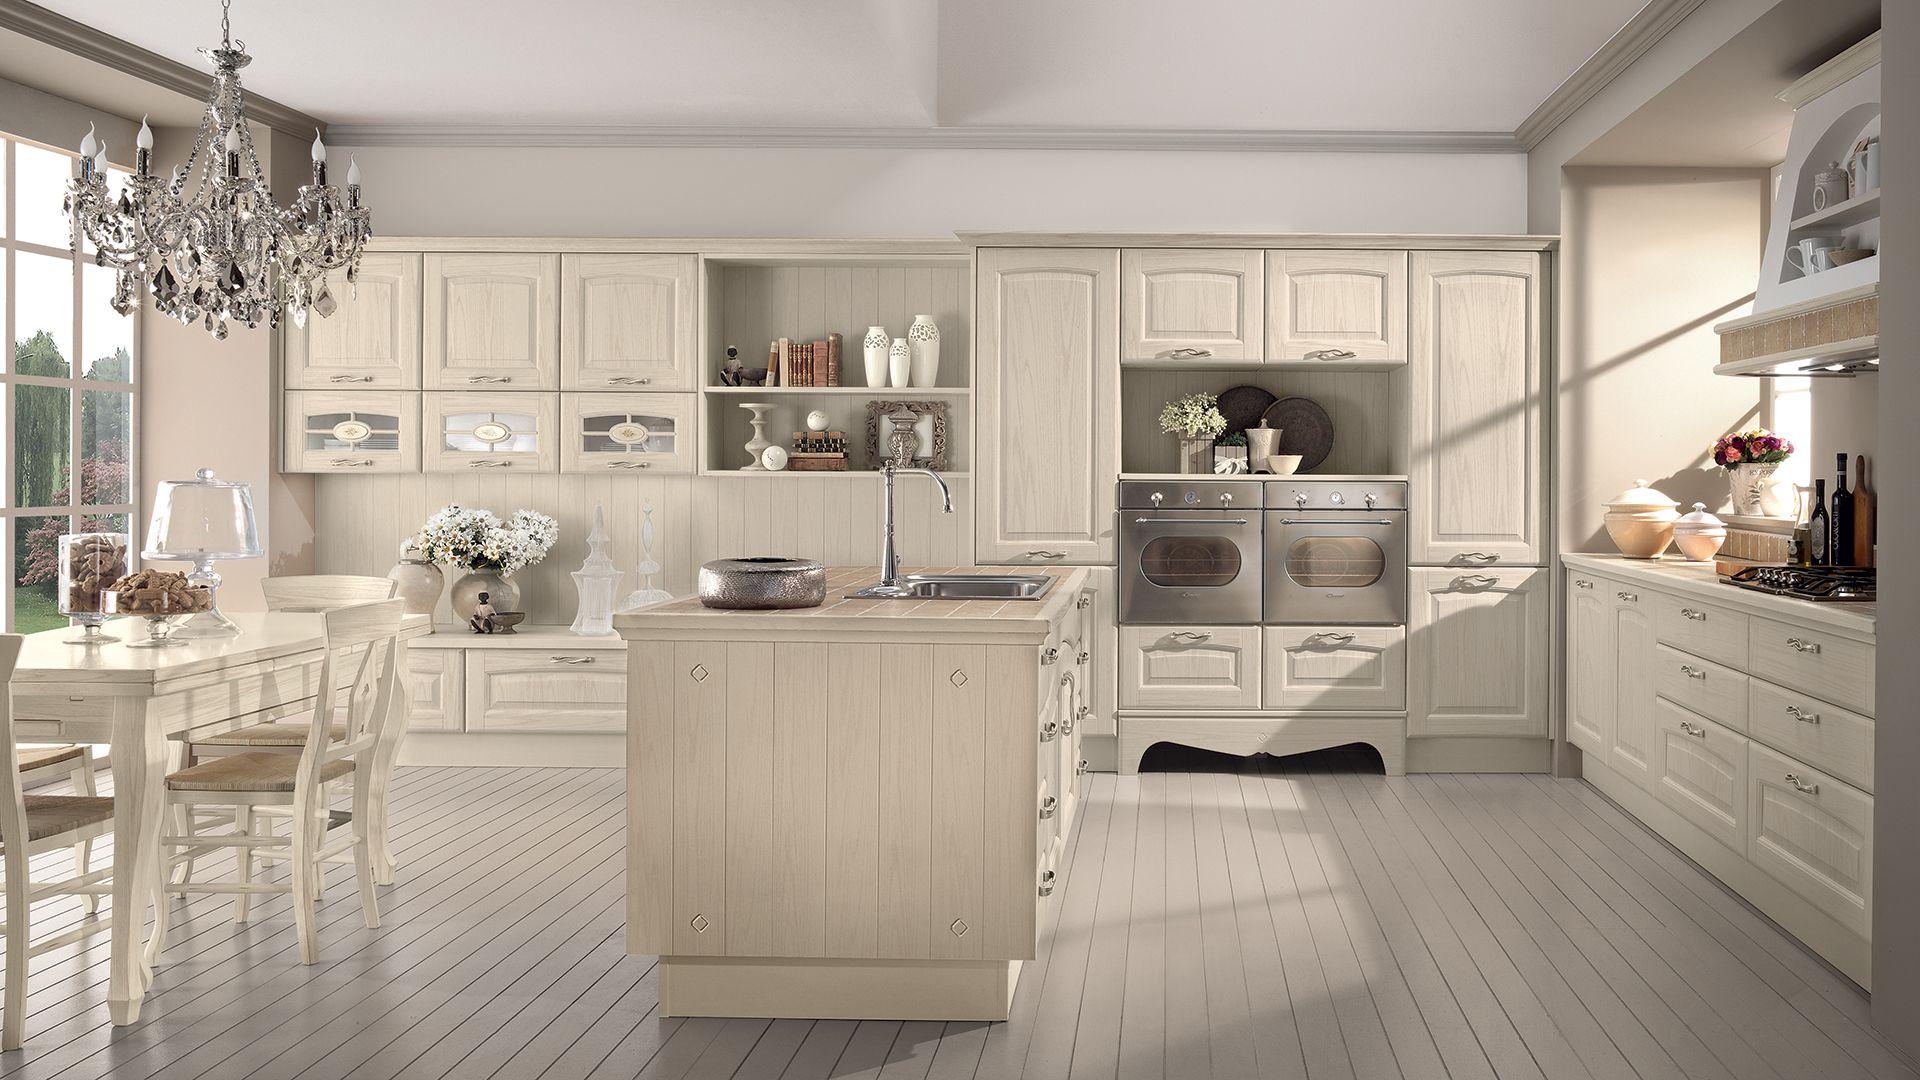 Cucina Classica Lube Veronica - Arredamenti Lupo | kitchens in 2019 ...